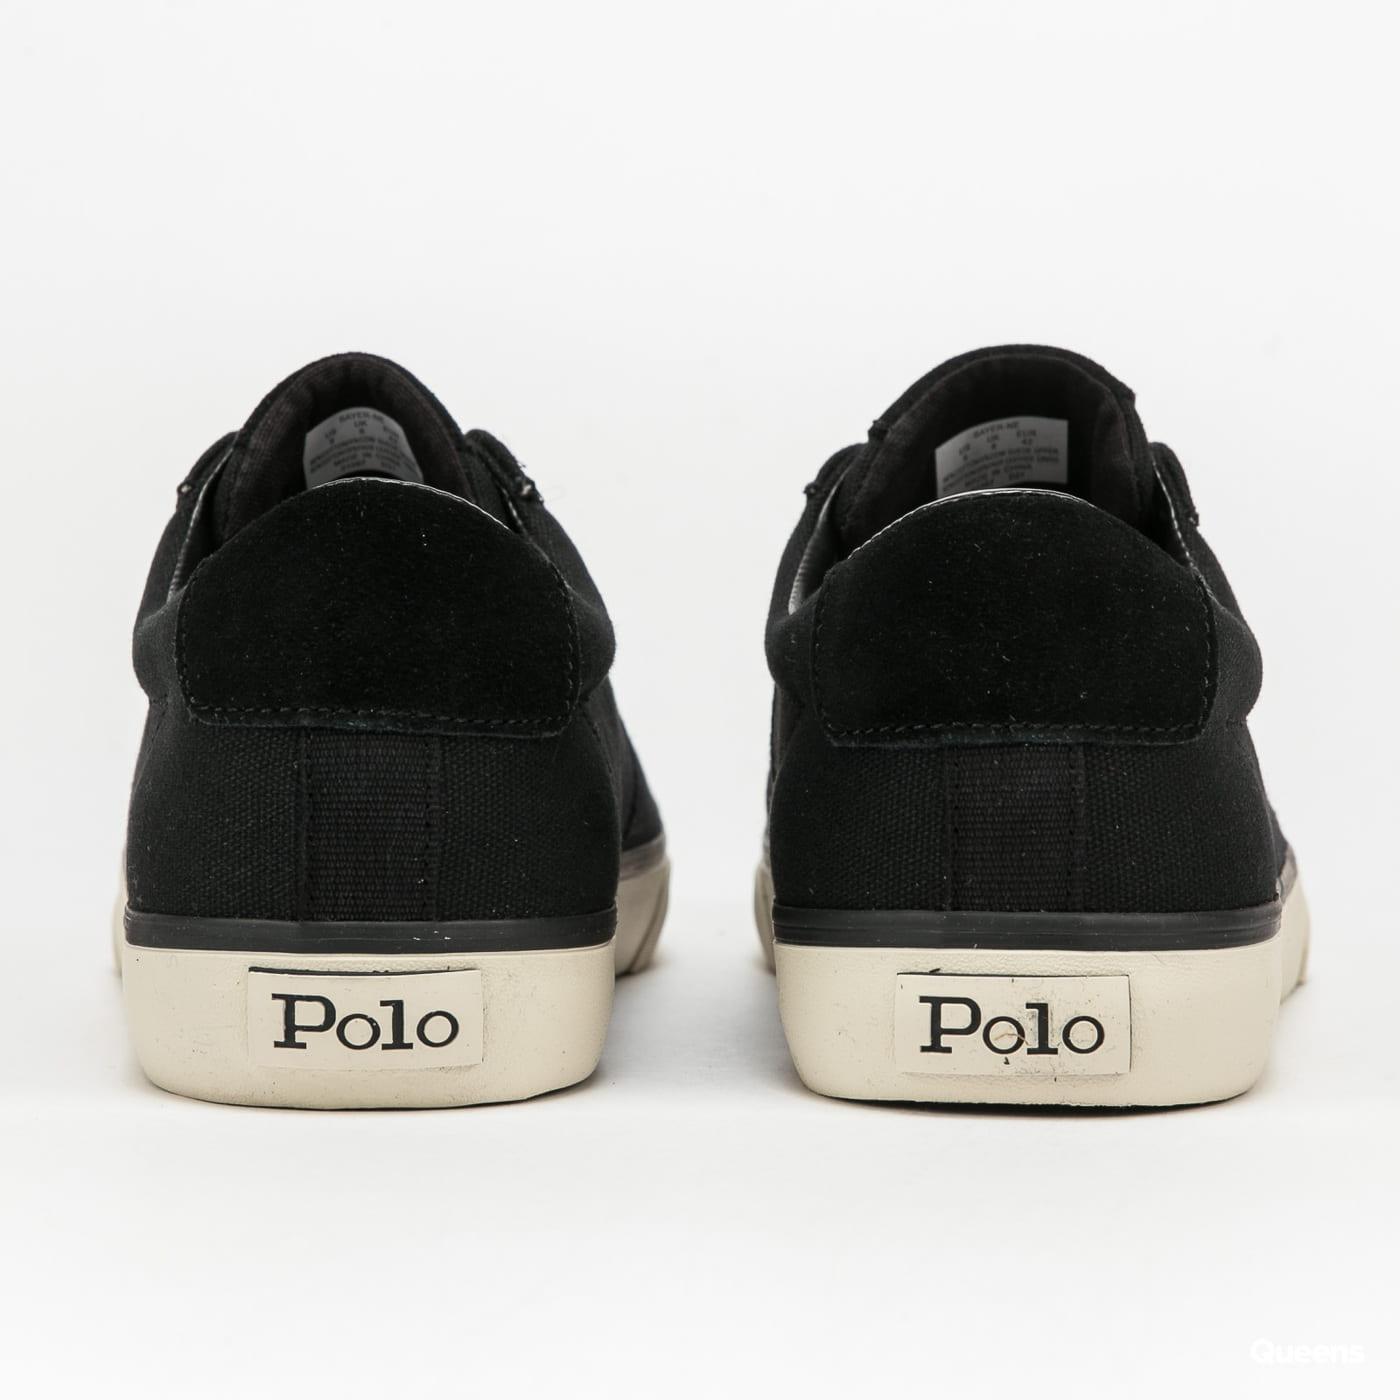 Polo Ralph Lauren Sayer black